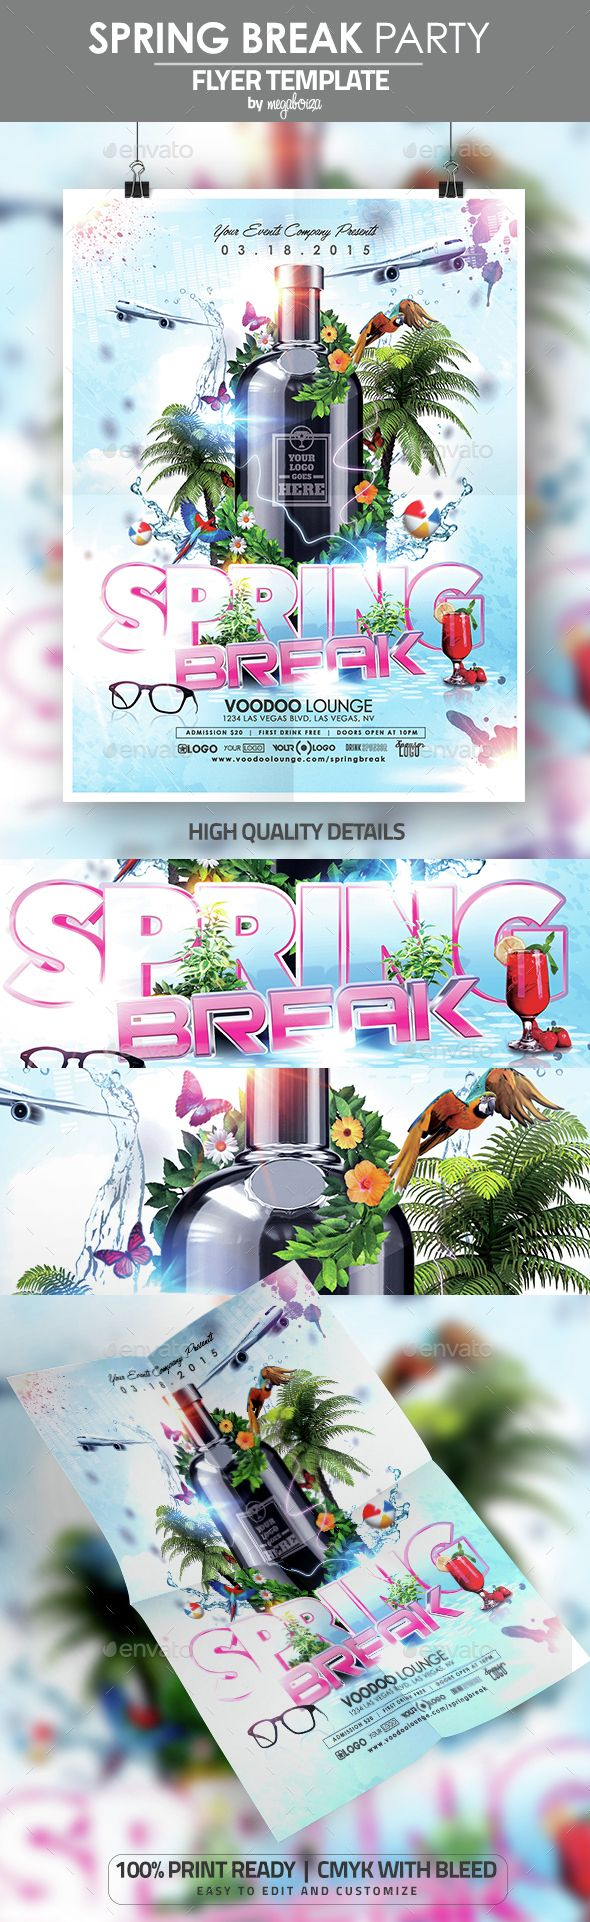 Spring Break Party Flyer / Poster Template,3d, ball, beach, break, butterflies, colorful, easter, flowers, gloss, graduation, modern, parrots, party, shine, sleek, sound, spring, summer, vacation, vibrant